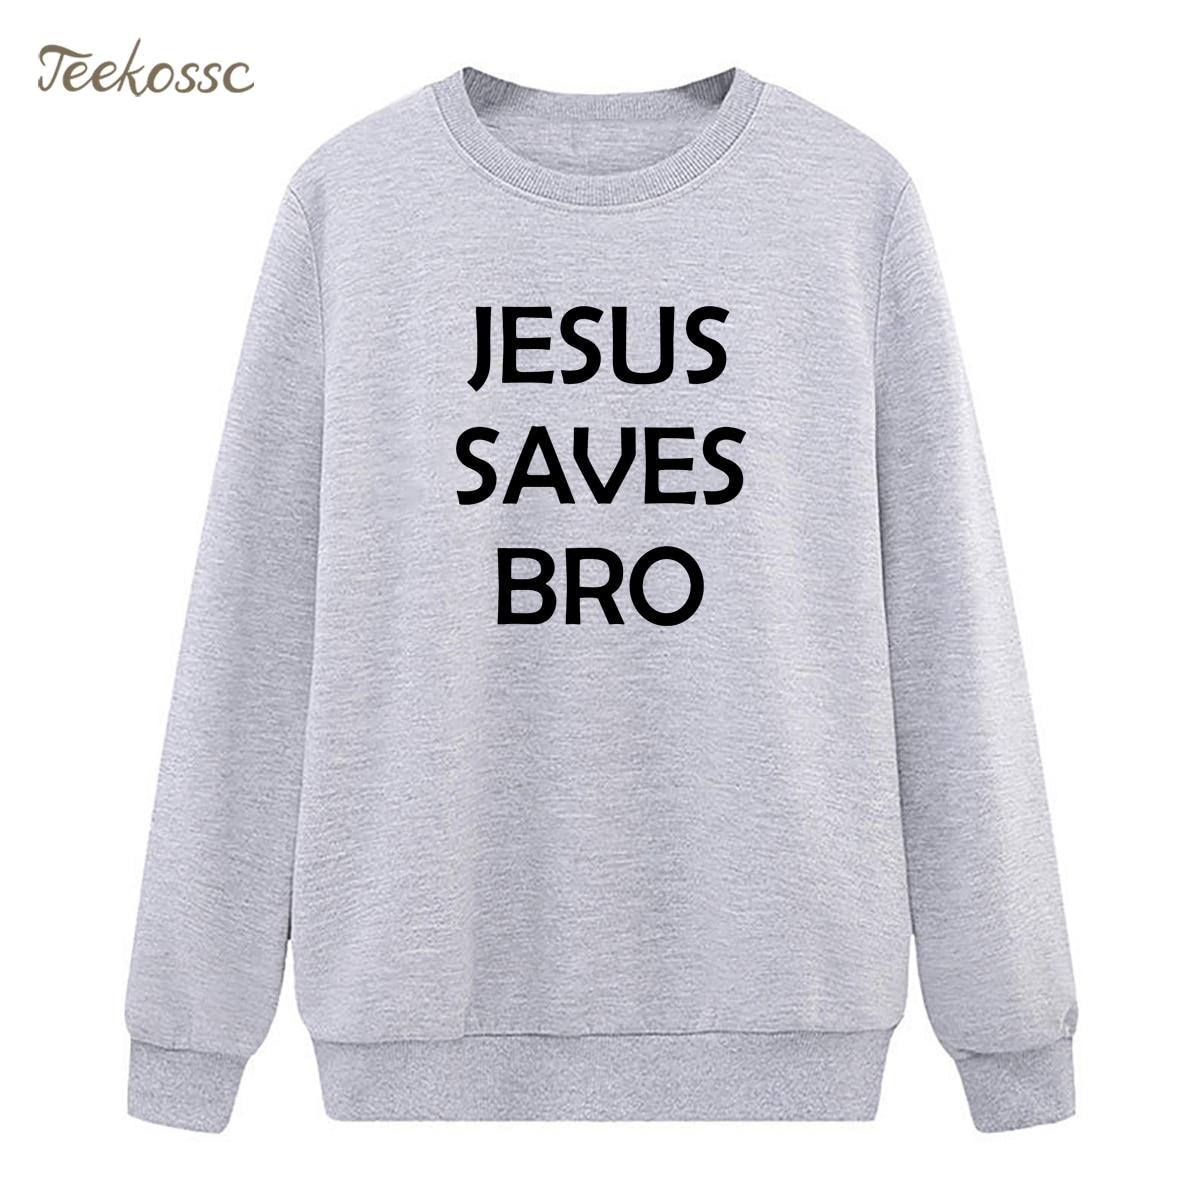 Jesus Saves Bro Print Super Jesus Christ Sweatshirts Womens Hoodie 2018 Hipster Winter Autumn Lady Loose Fleece Warm Sportswear